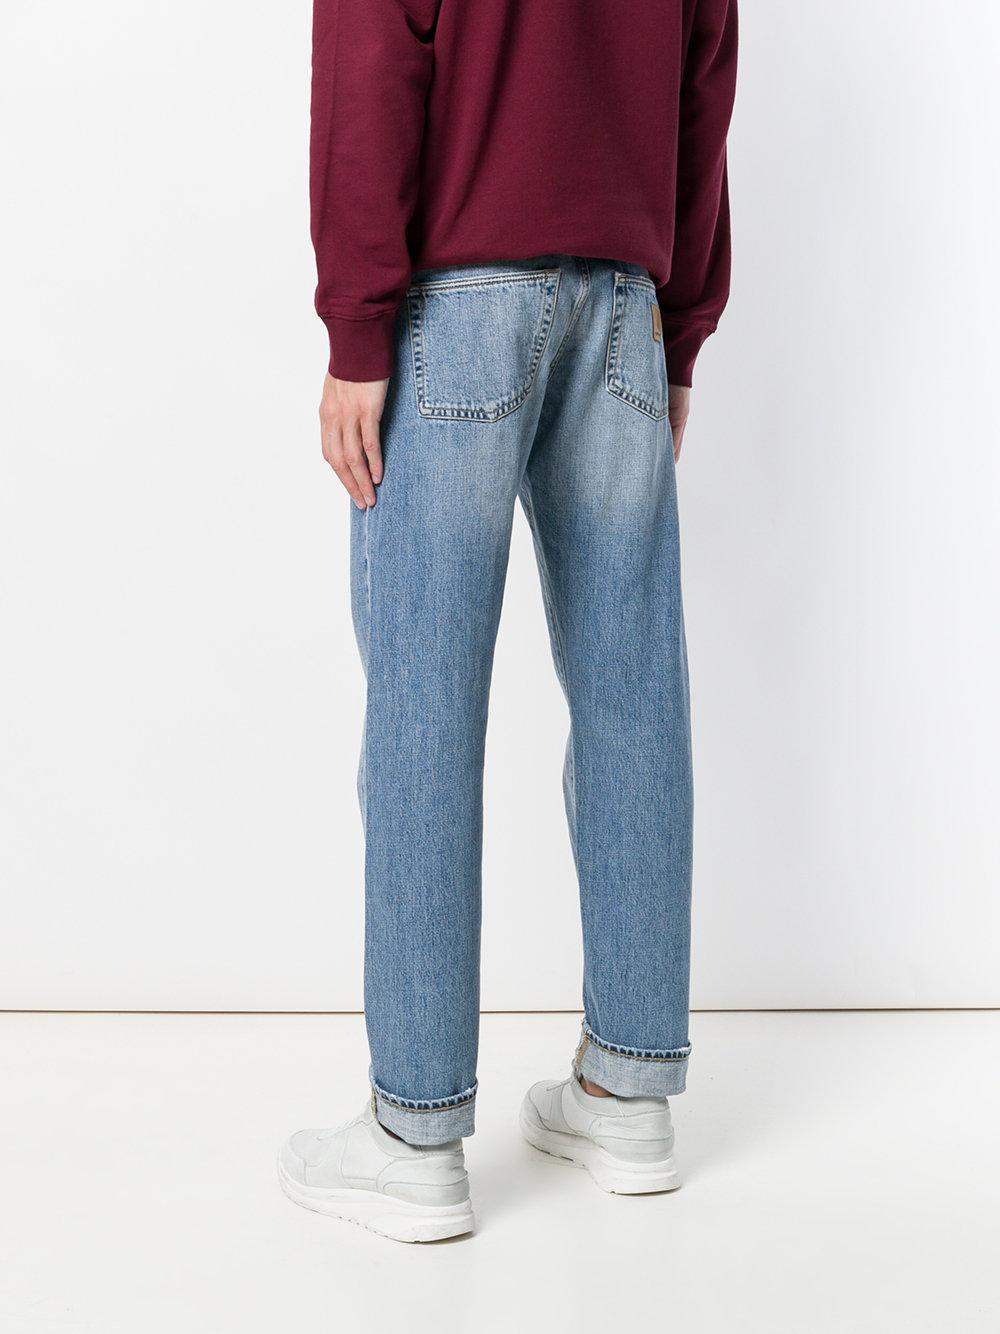 Carhartt Denim Klondike Jeans in Blue for Men